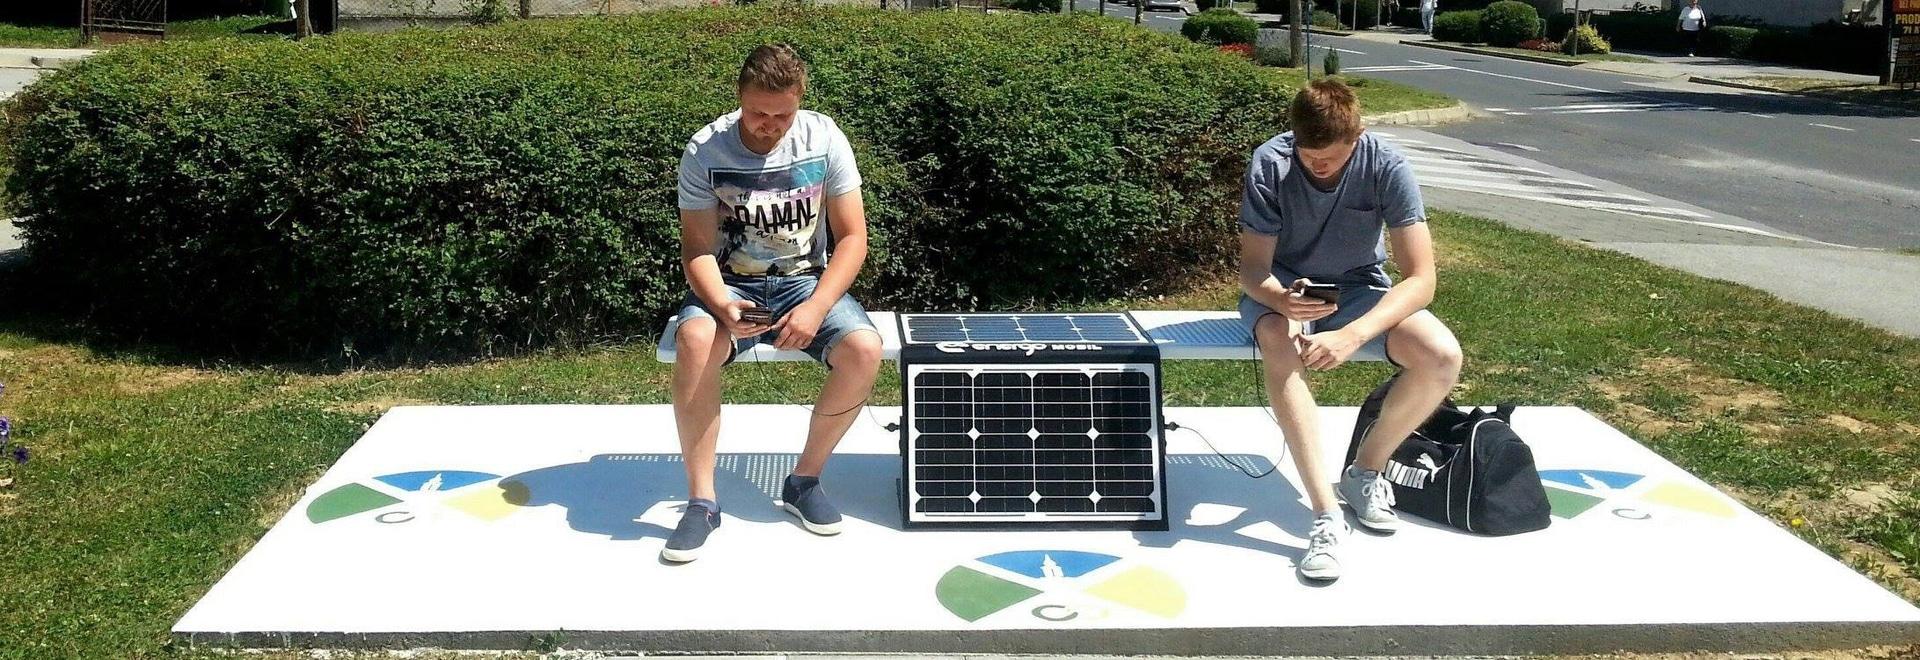 Posušje erhielt die erste Solarbank